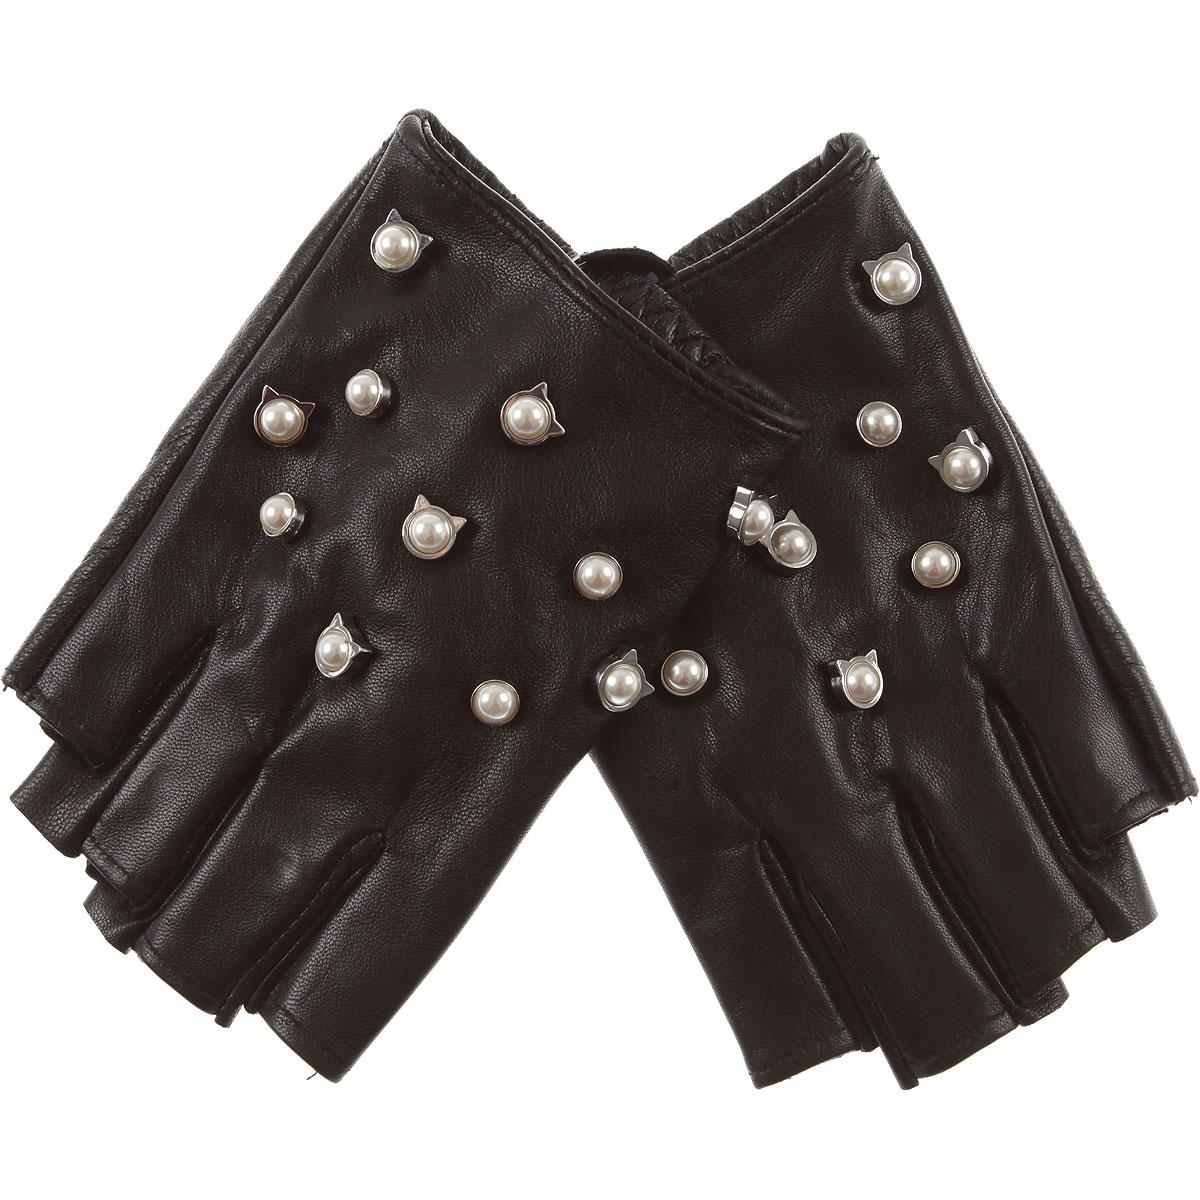 Image of Karl Lagerfeld Gloves for Women, Black, Leather, 2017